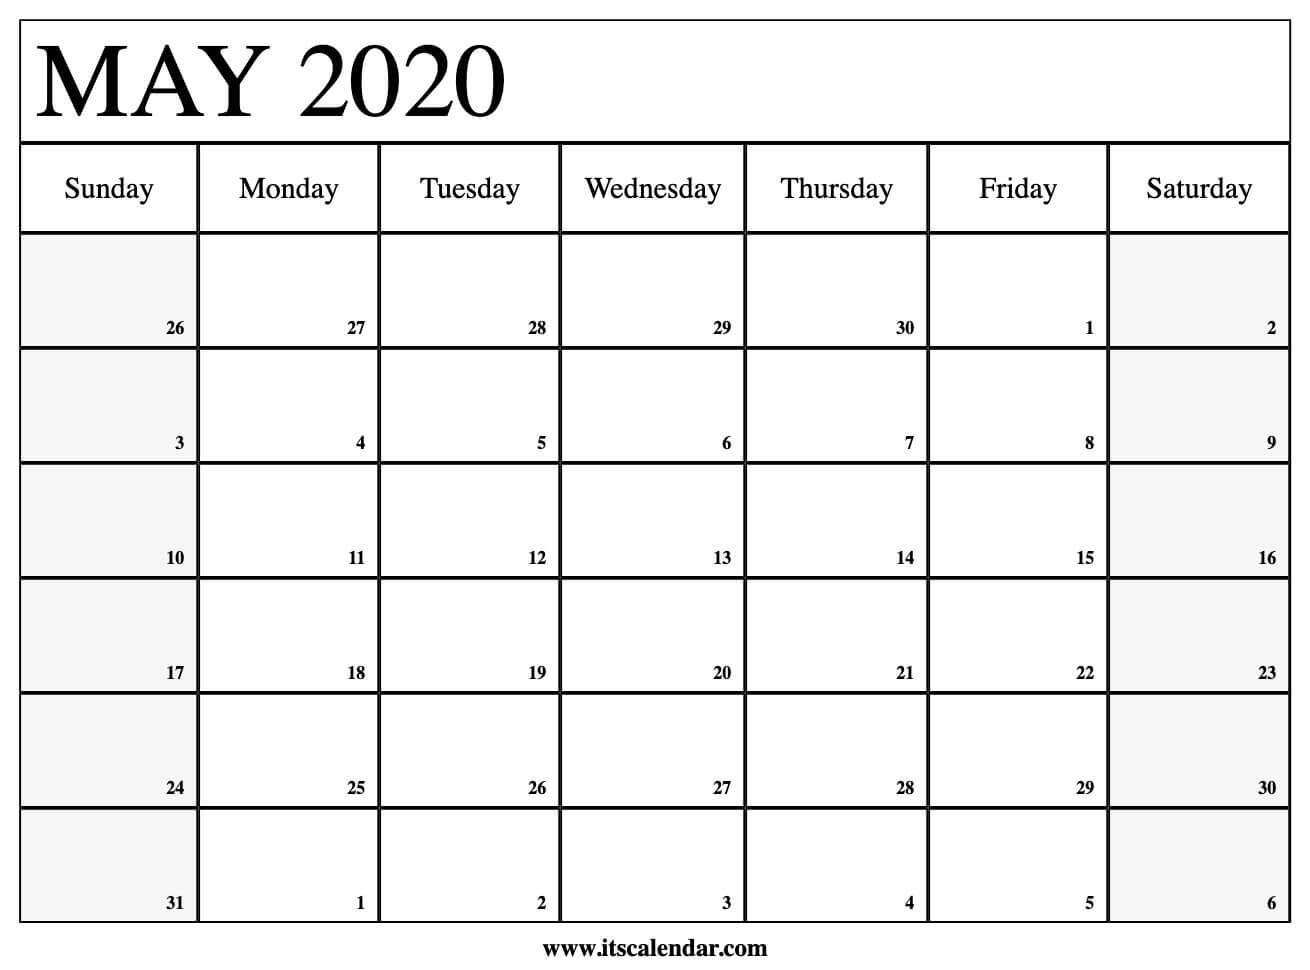 May Printable Calendar 2020.Free Printable May 2020 Calendar